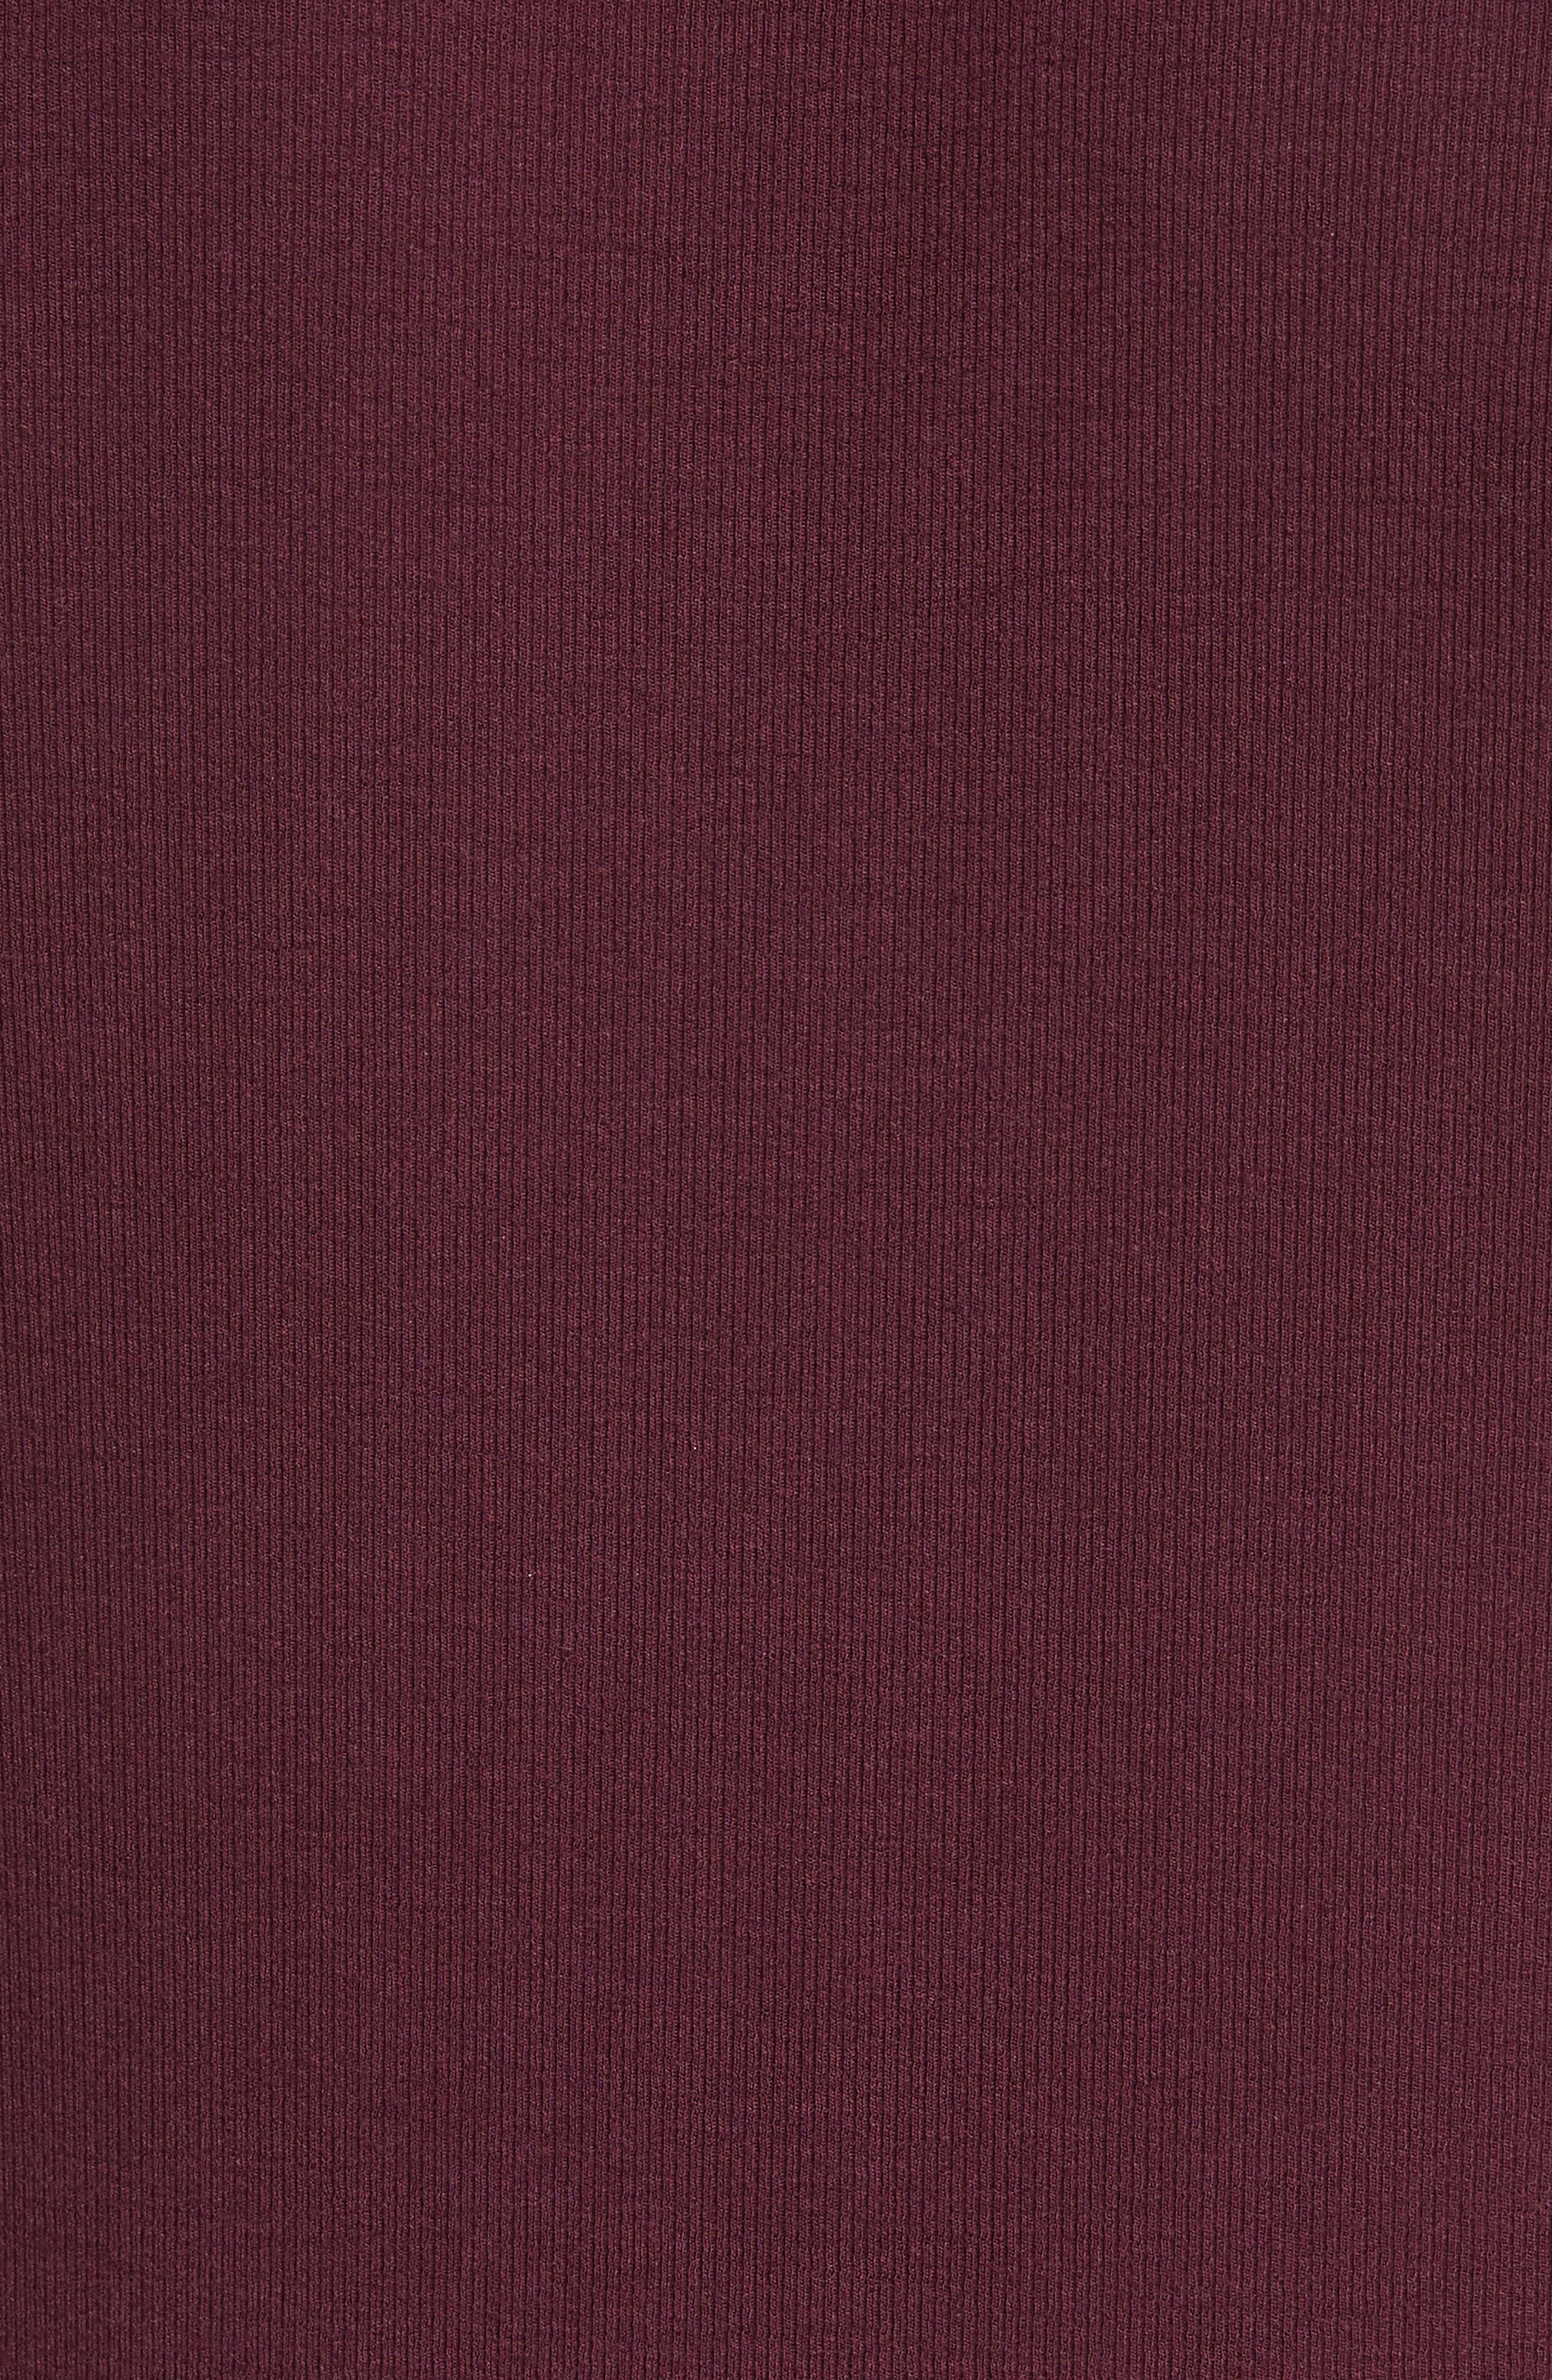 Rib Modal Crewneck Sweater,                             Alternate thumbnail 5, color,                             Merlot